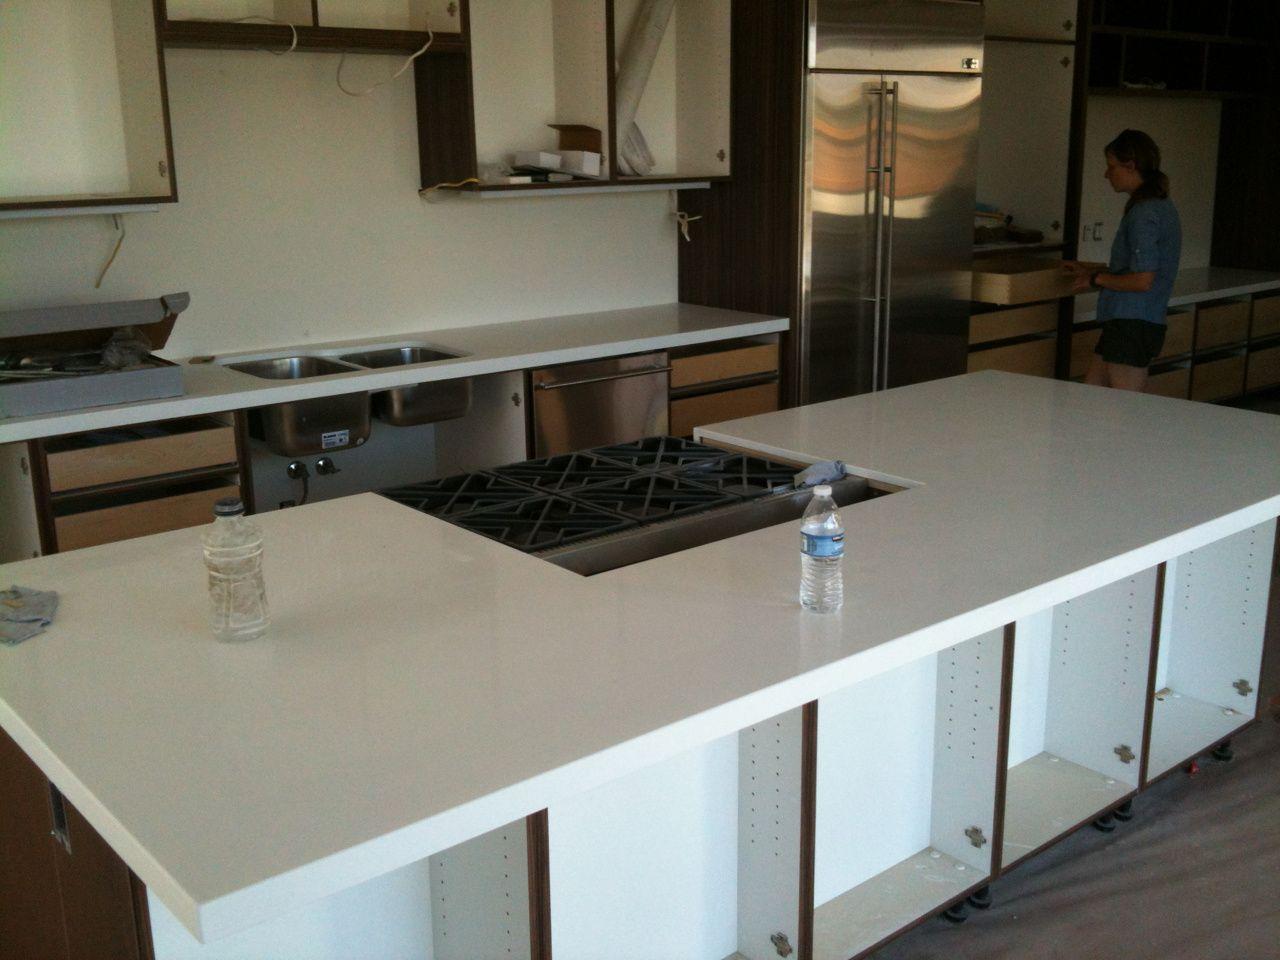 55 white quartz countertops stain kitchen island countertop ideas check more at http on kitchen island ideas white quartz id=38487